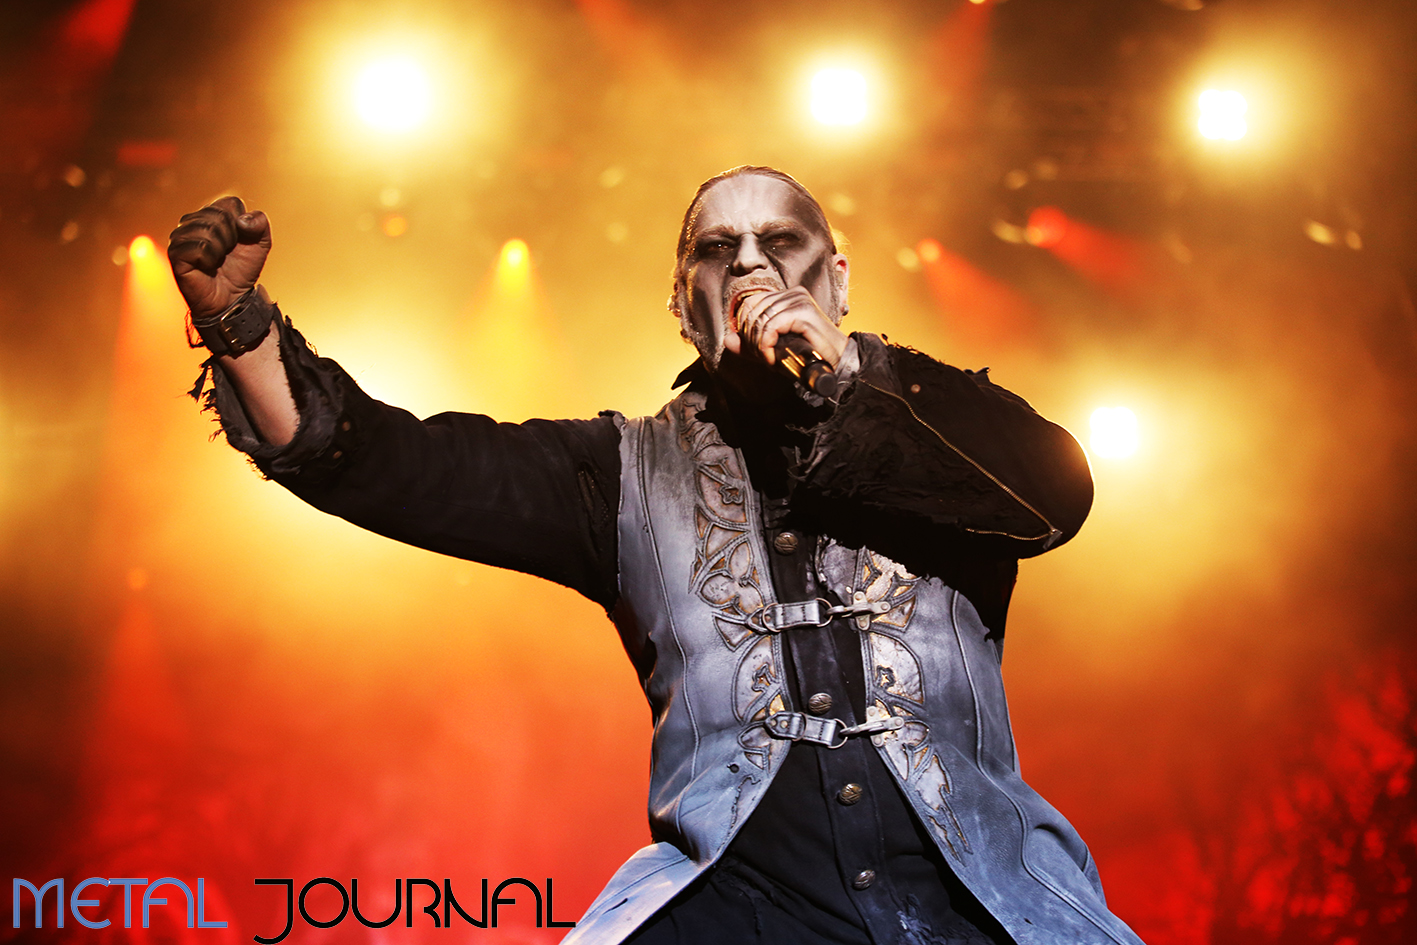 powerwolf - metal journal rock fest barcelona 2019 pic 6